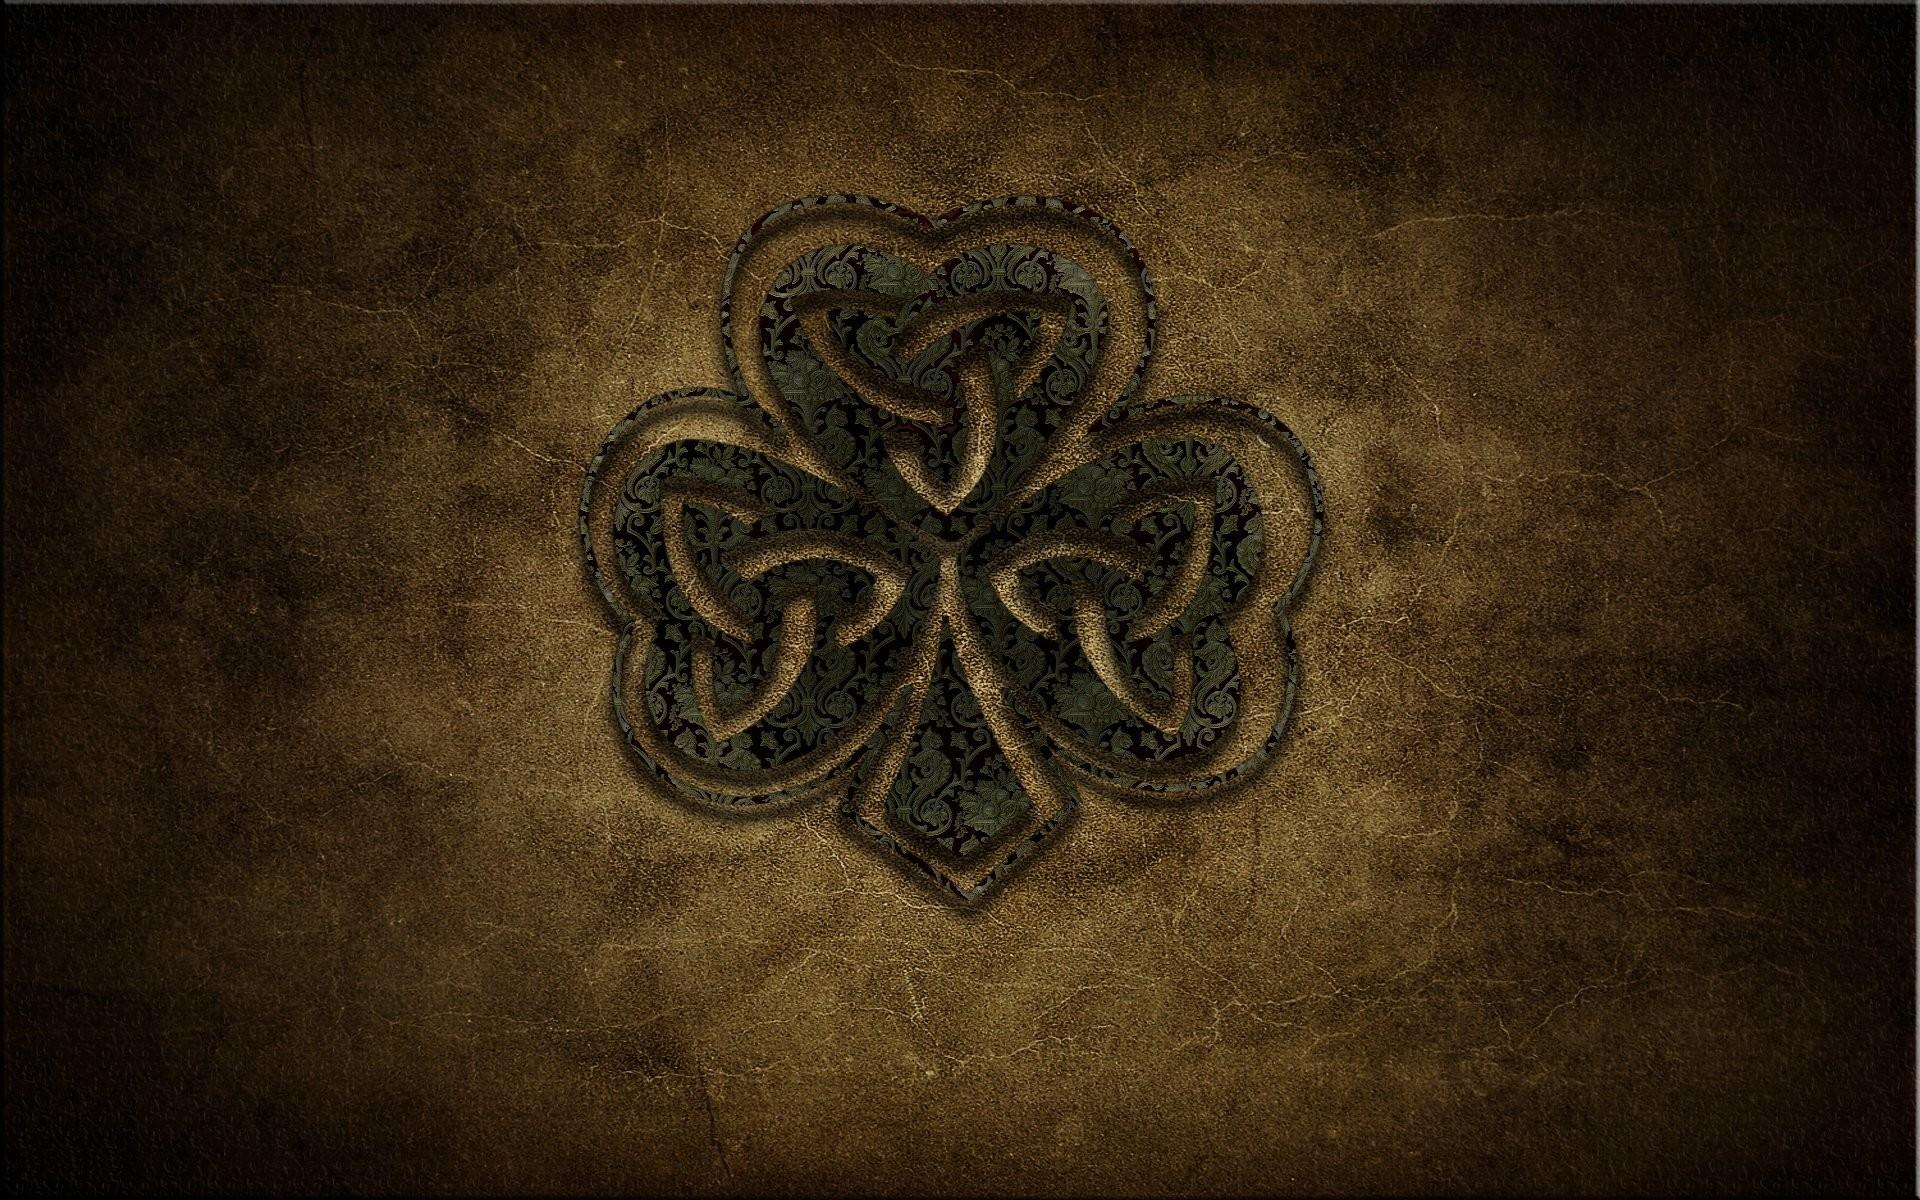 Irish Shamrock HD Widescreen Wallpapers – UKI-Full HD Pics